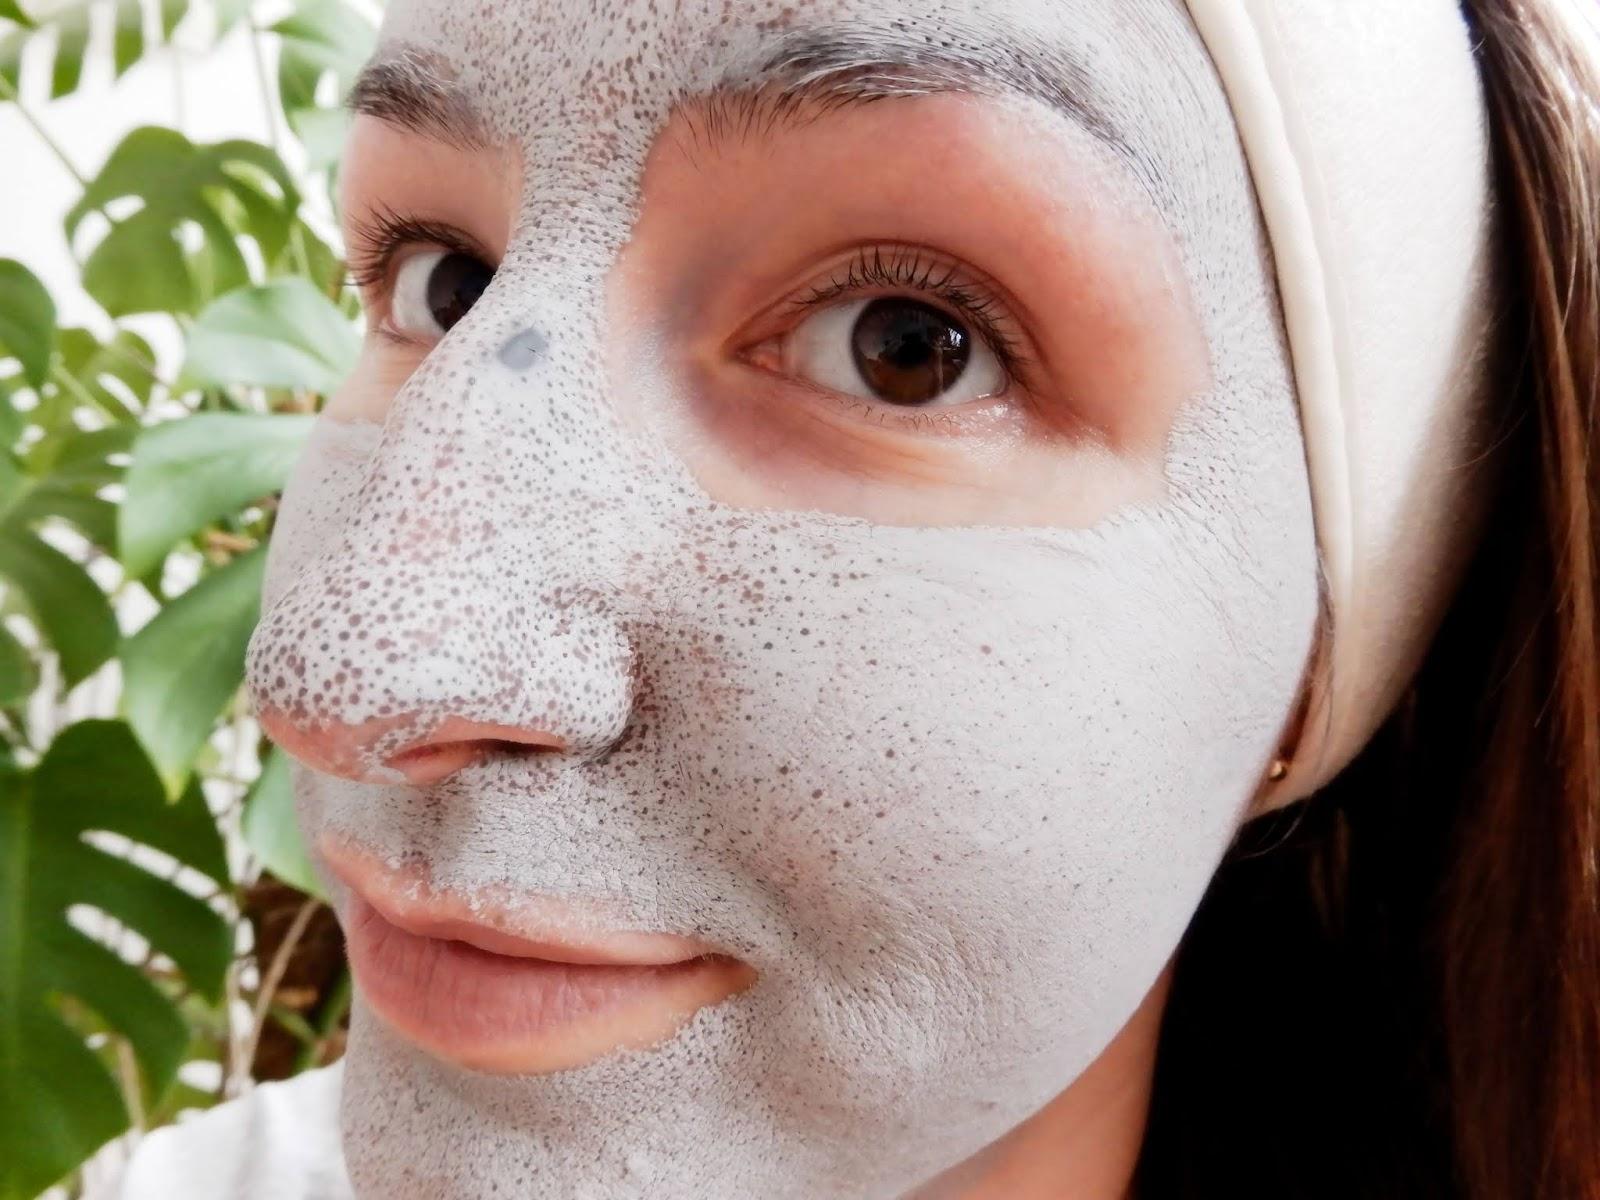 Recenzja Tołpa Peeling 3 enzymy, recenzja Tołpa Maska czarny detox, Tołpa Peeling 3 enzymy opinie, Tołpa Peeling 3 enzymy działanie,